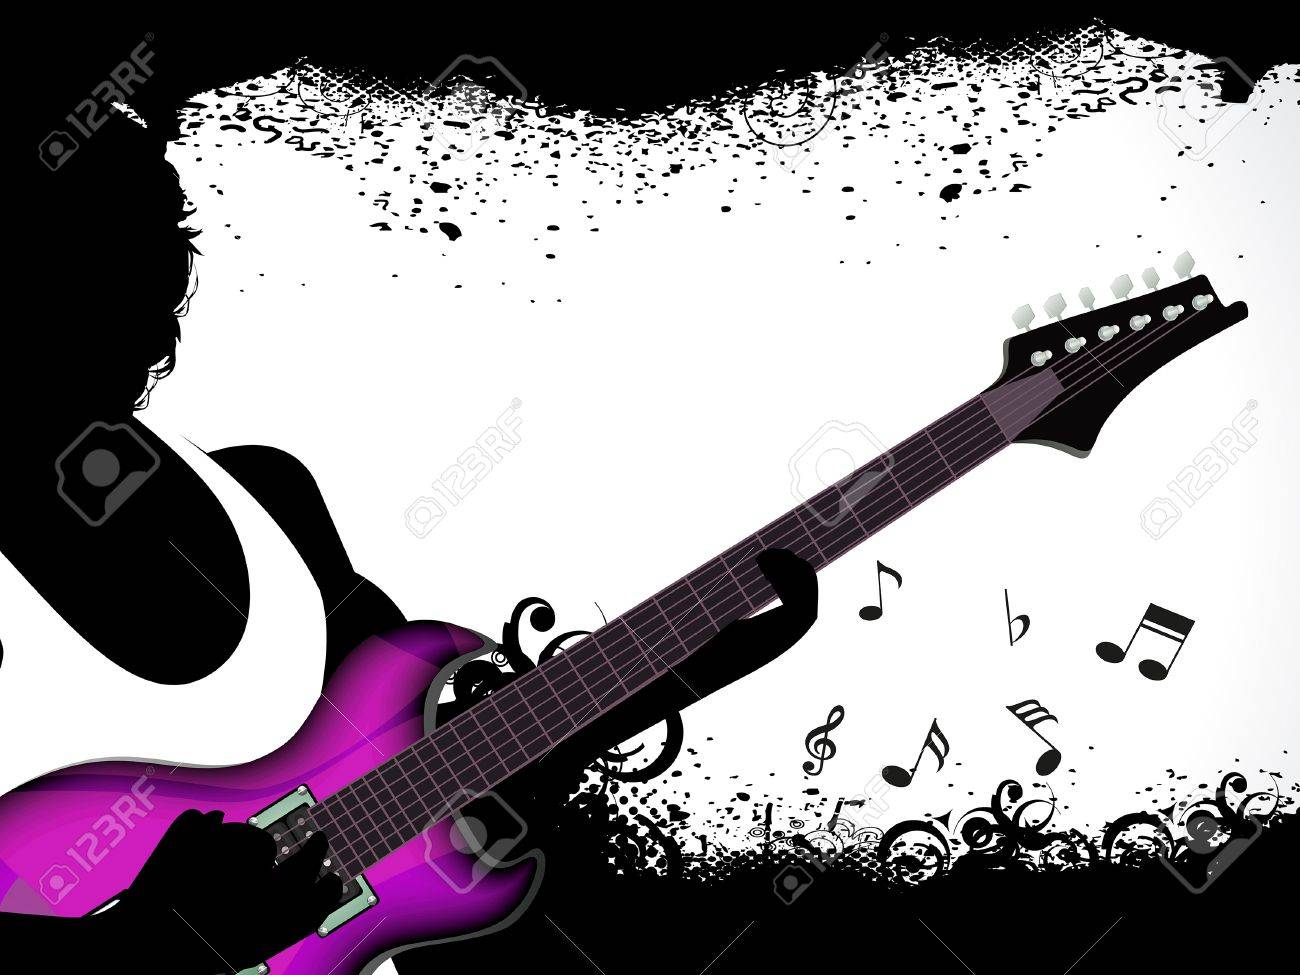 Pics photos rock concert background - Vector Abstract Grungy Rock Concert Background